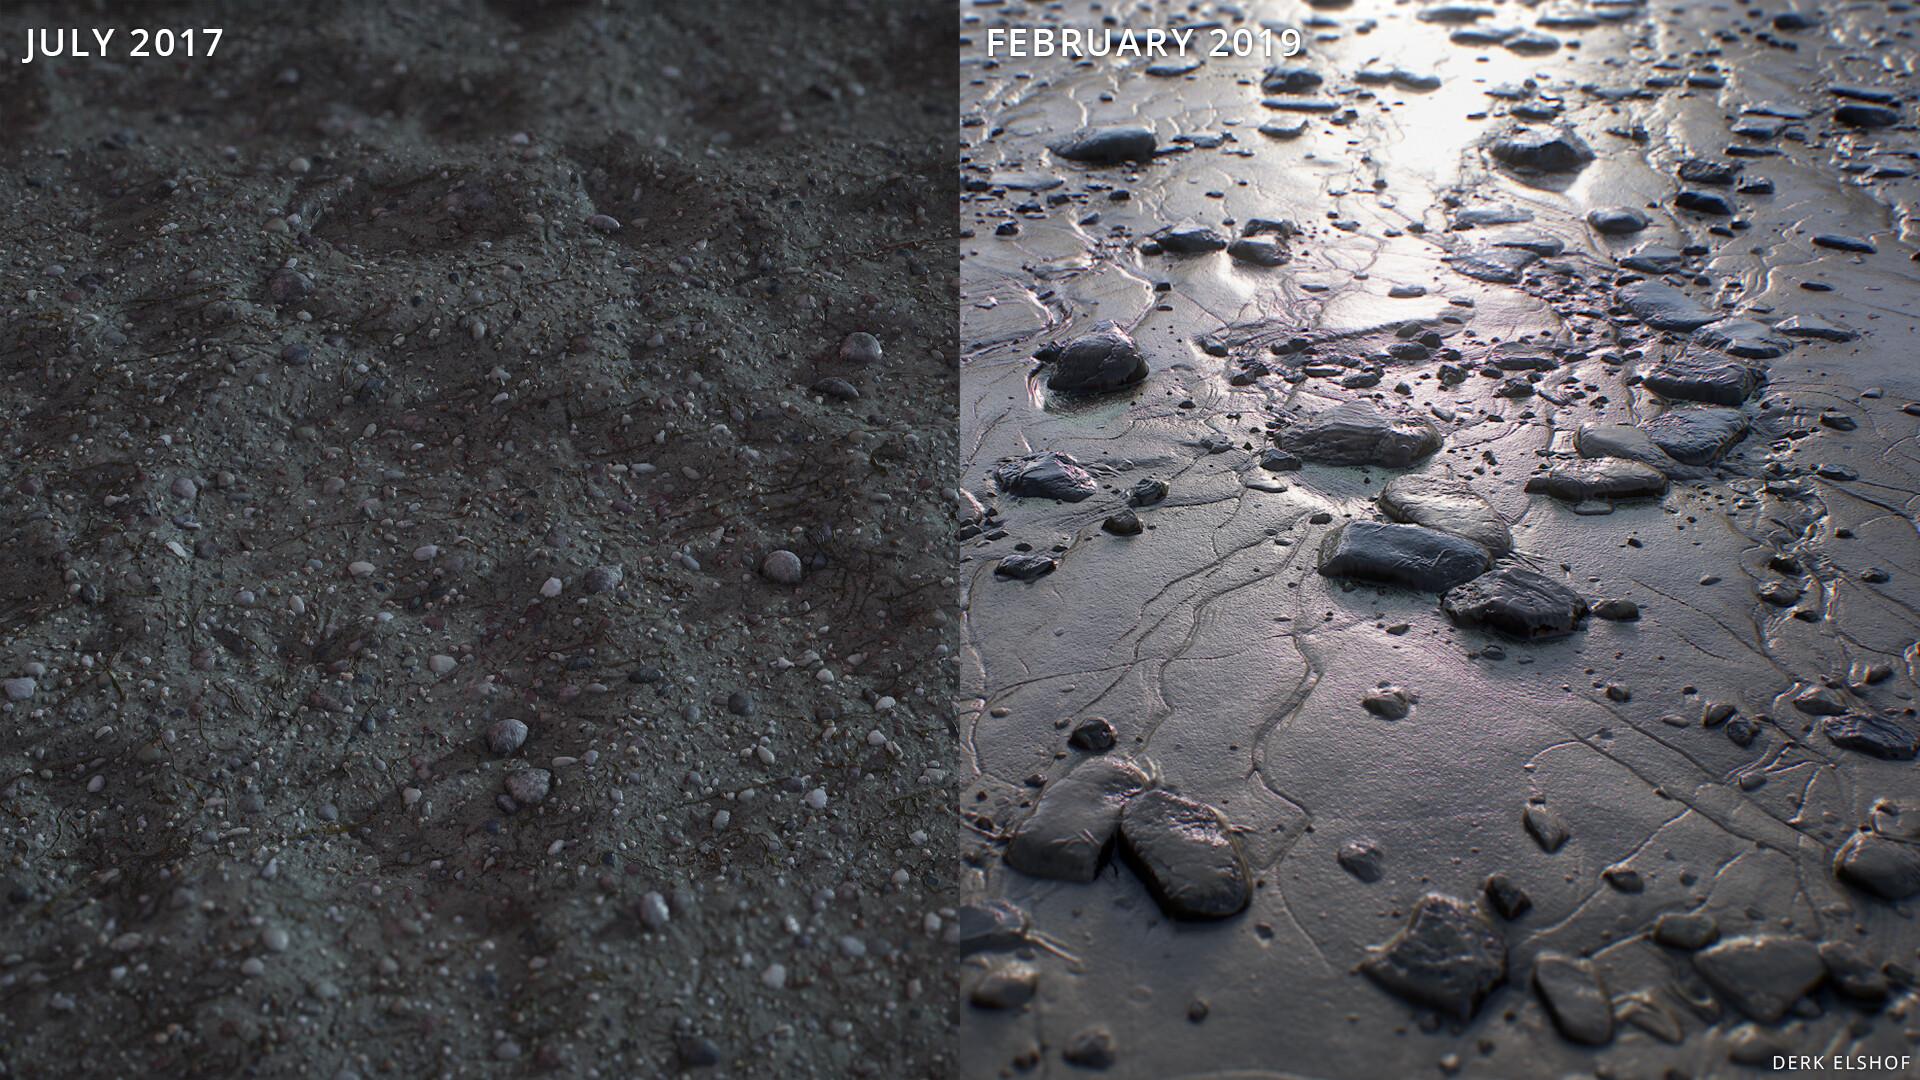 Derk elshof derkelshof beach pebbles 004